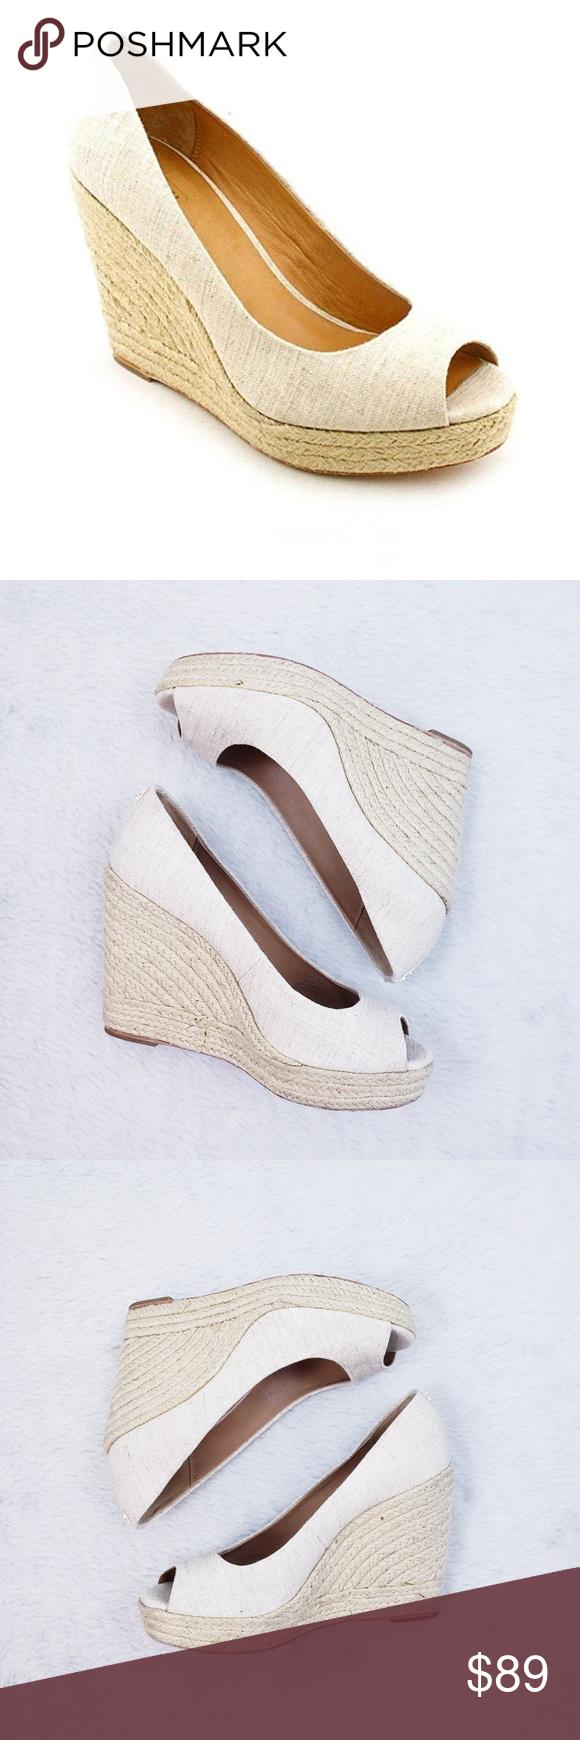 Peep toe wedge sandals, Peep toe wedges